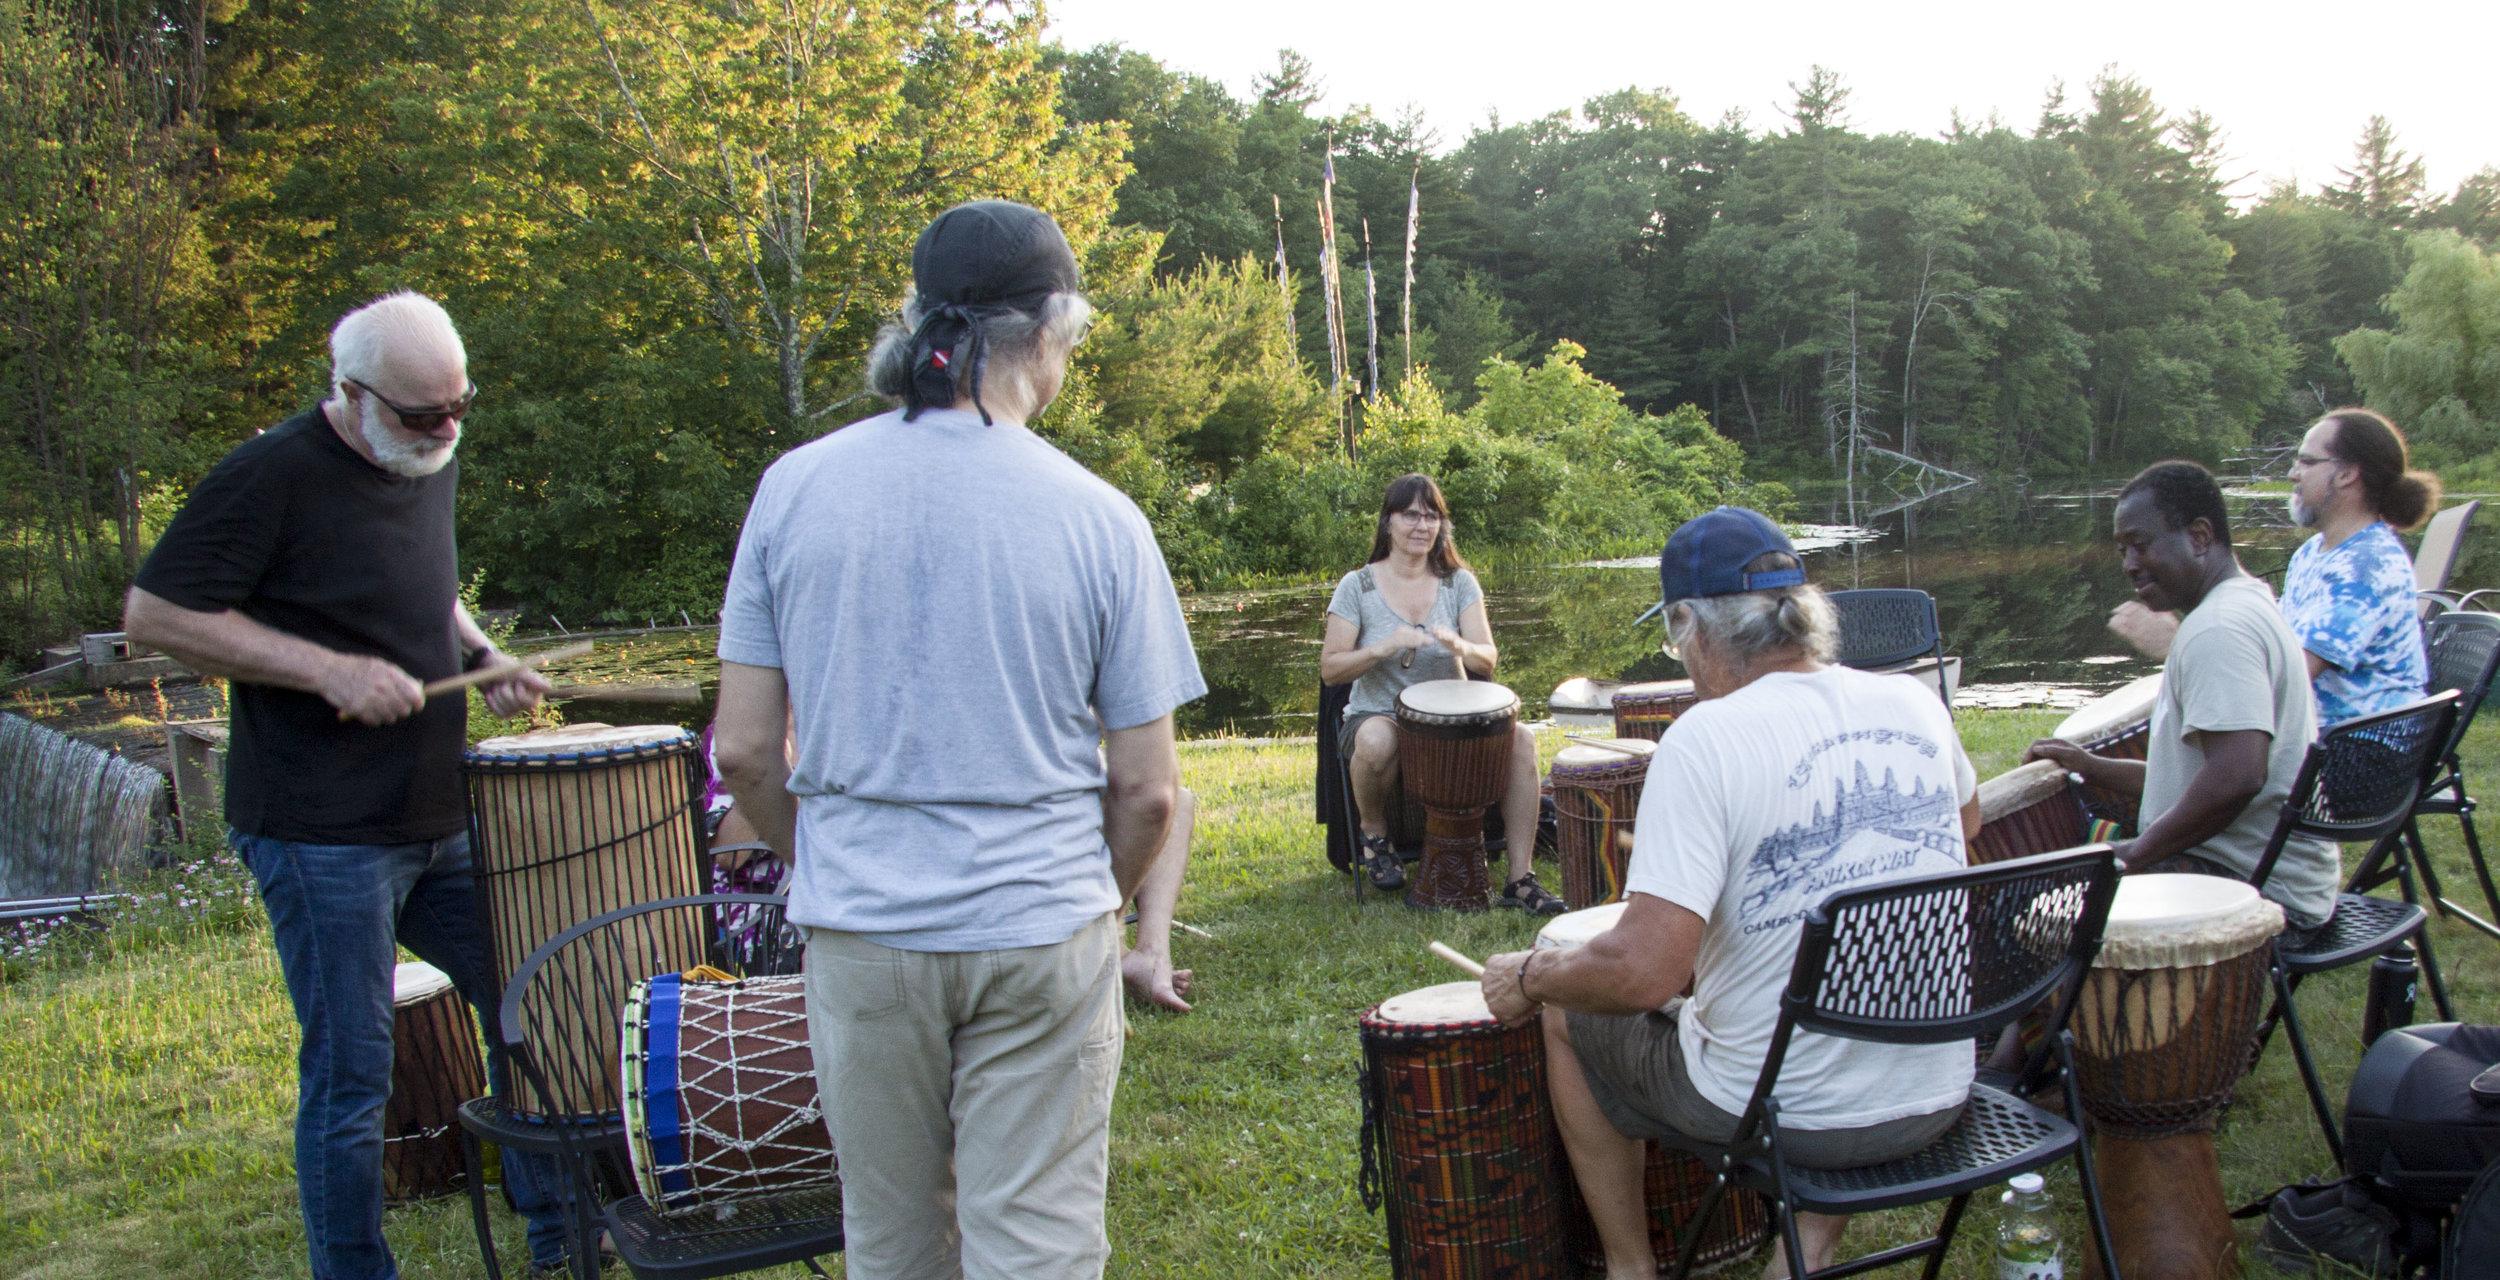 drumming near pond.jpg